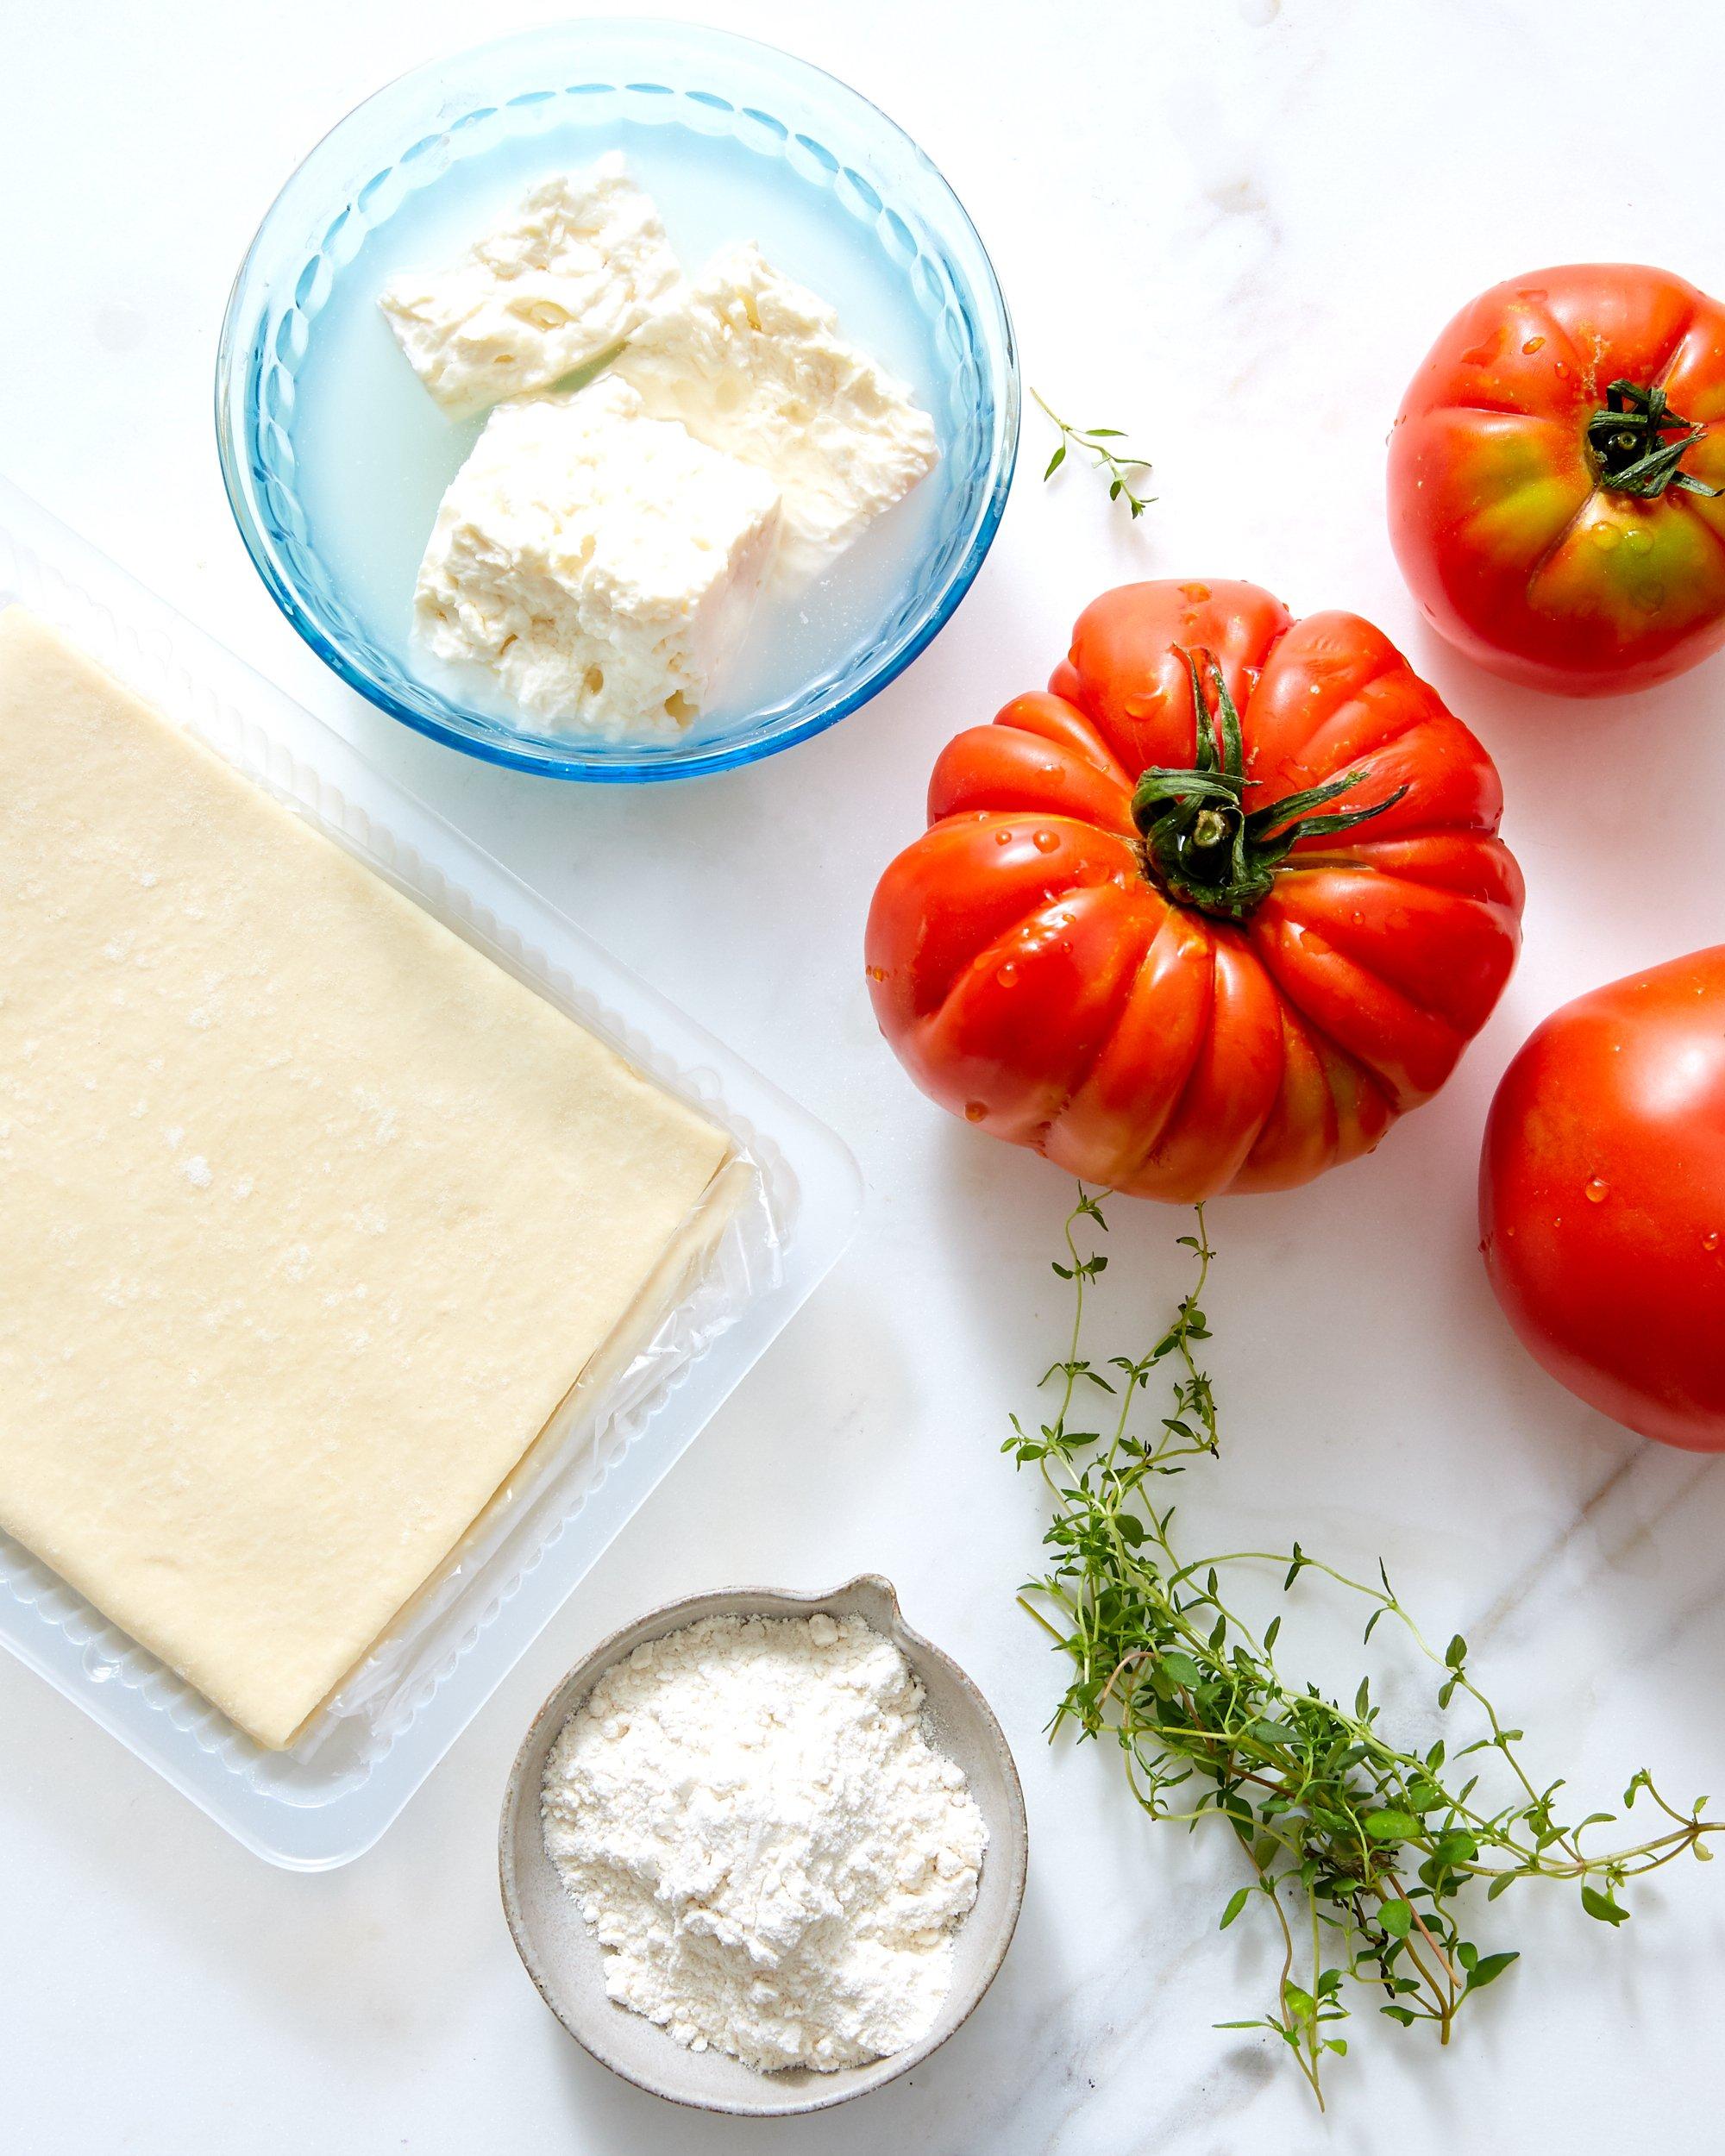 A Tomato-Feta Tart Just Right for Summer